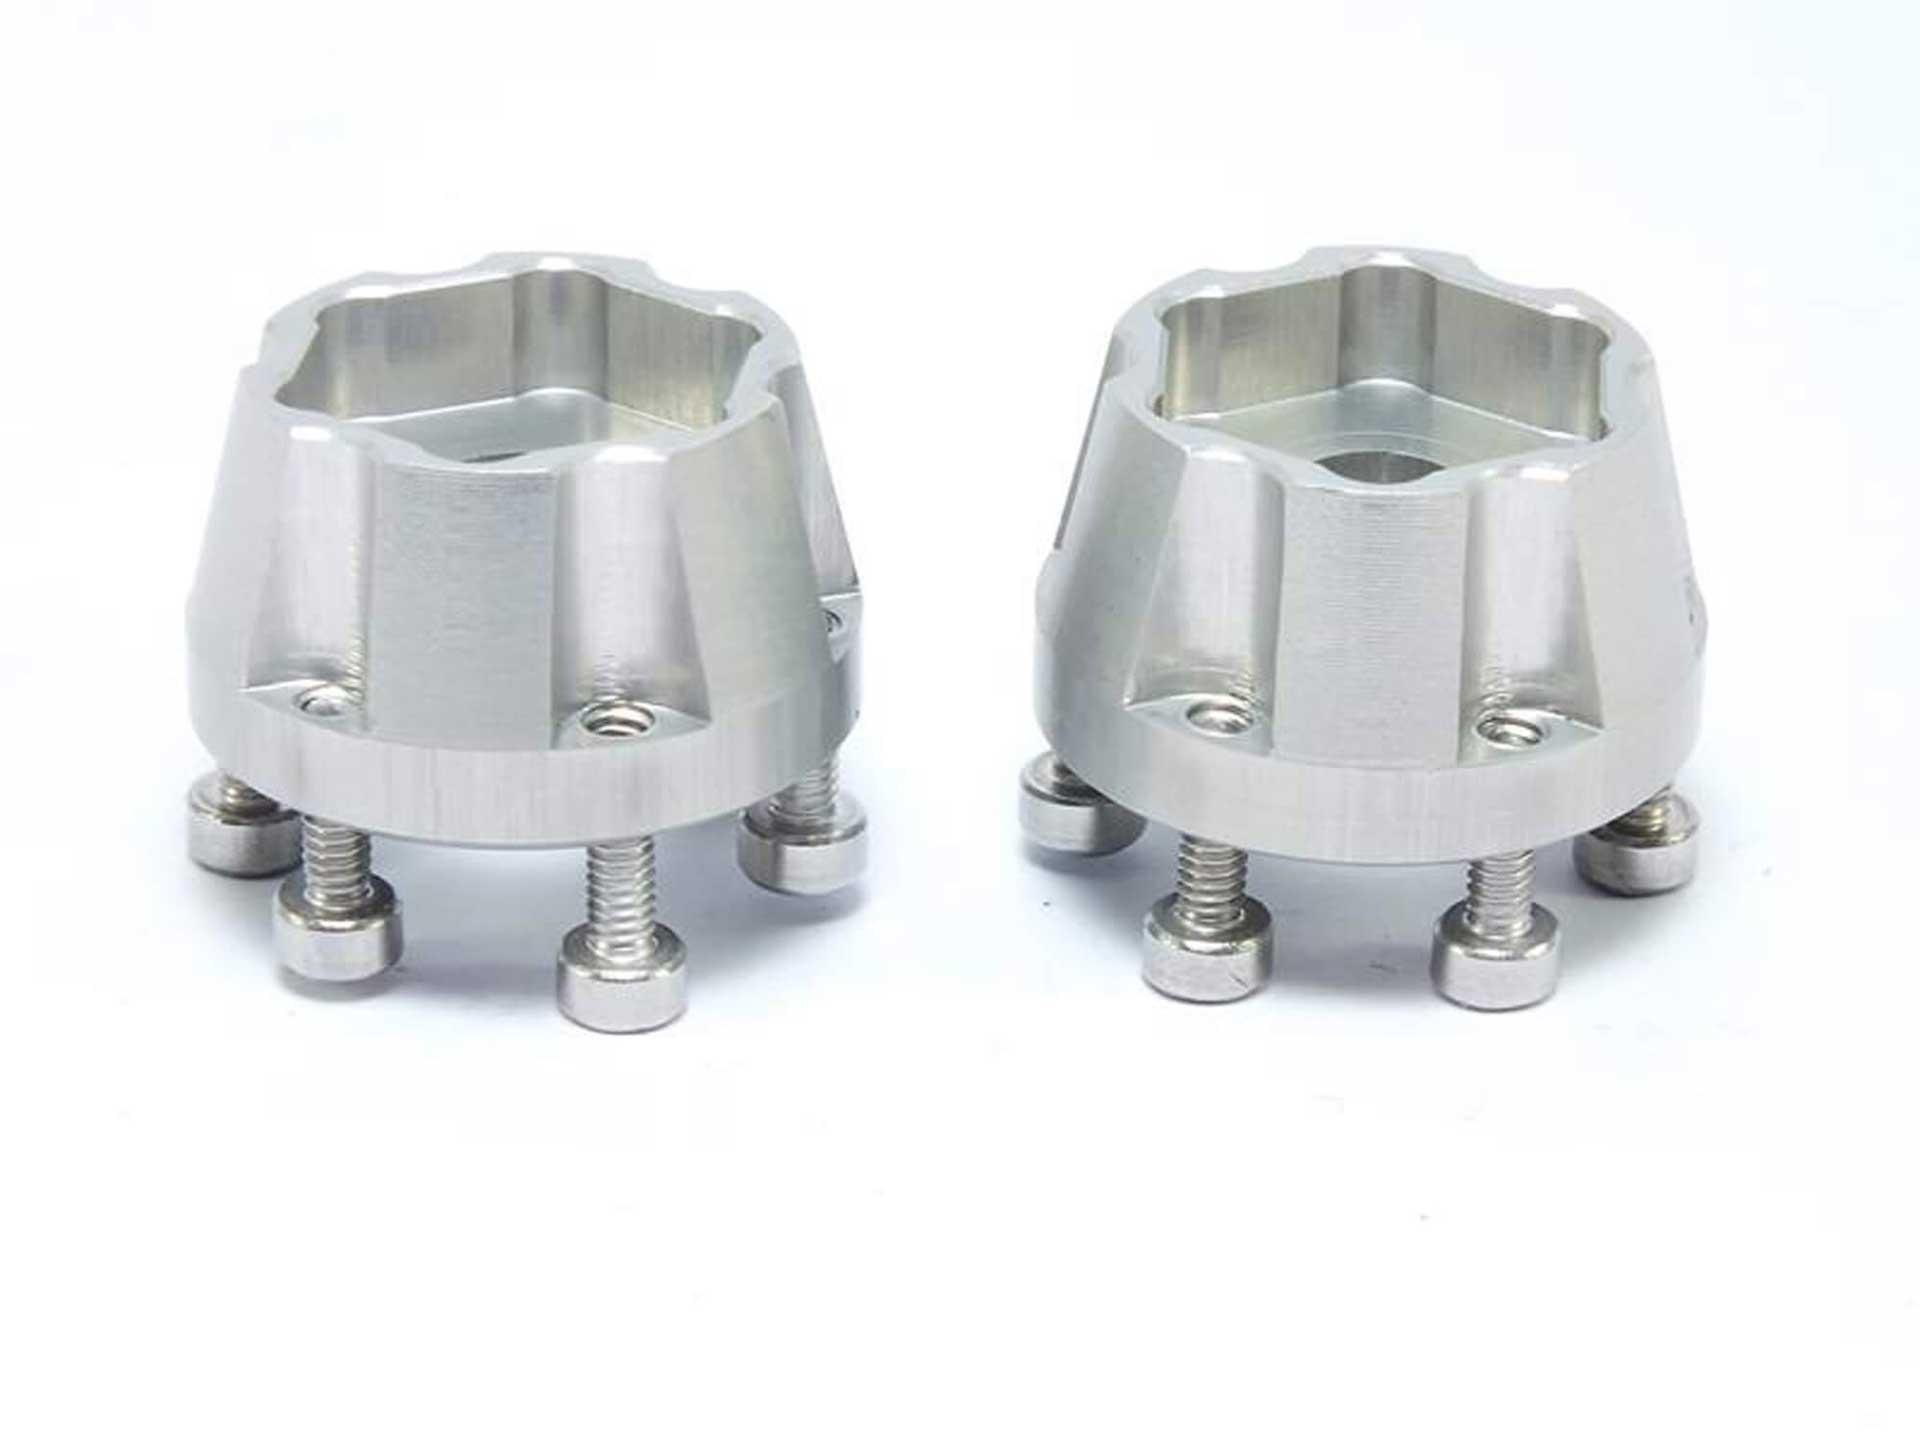 Metsafil Wheel hub 12mm Standard (2 St.)